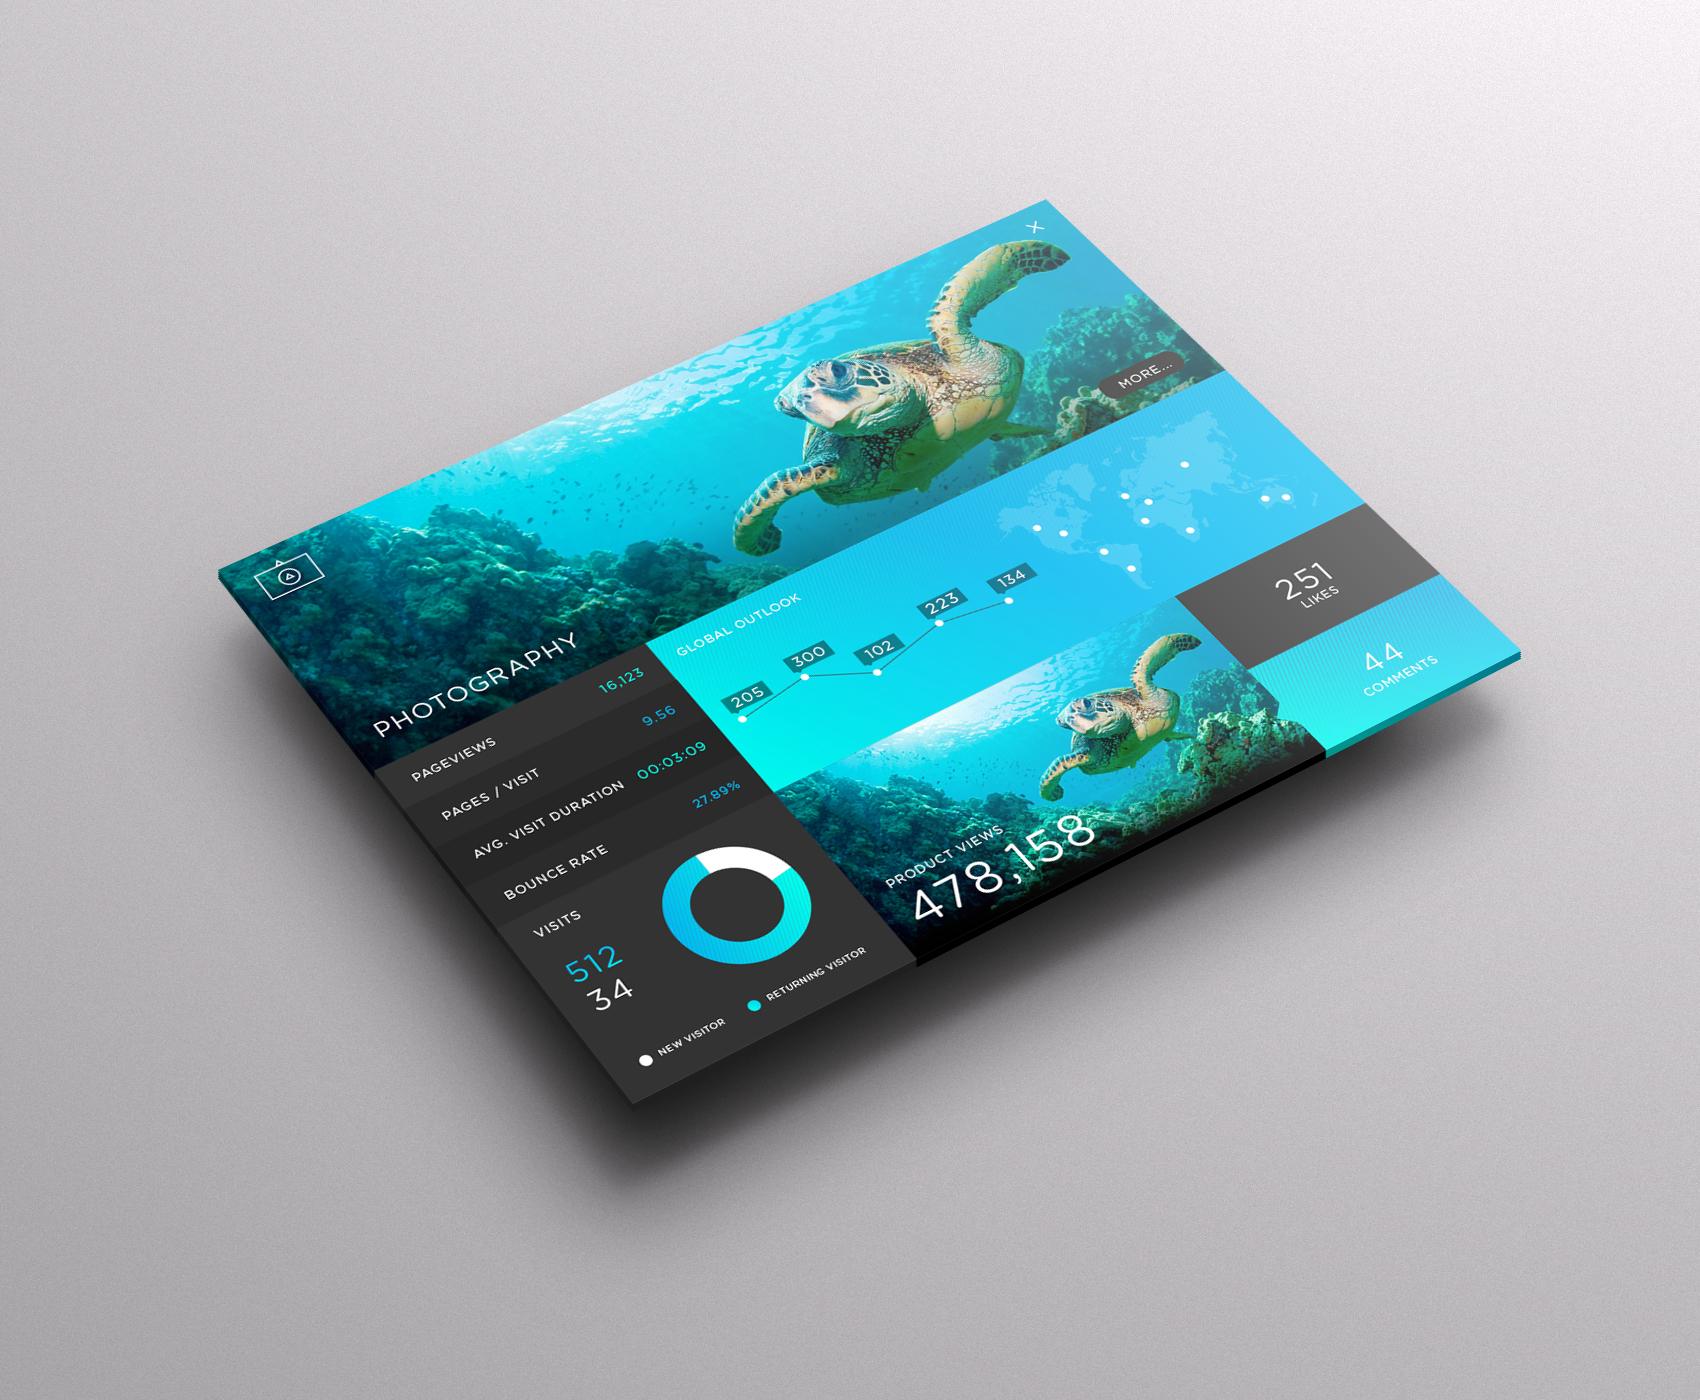 STUDIOJQ2013_DASHBOARD_P_3D.jpg by Studio–JQ